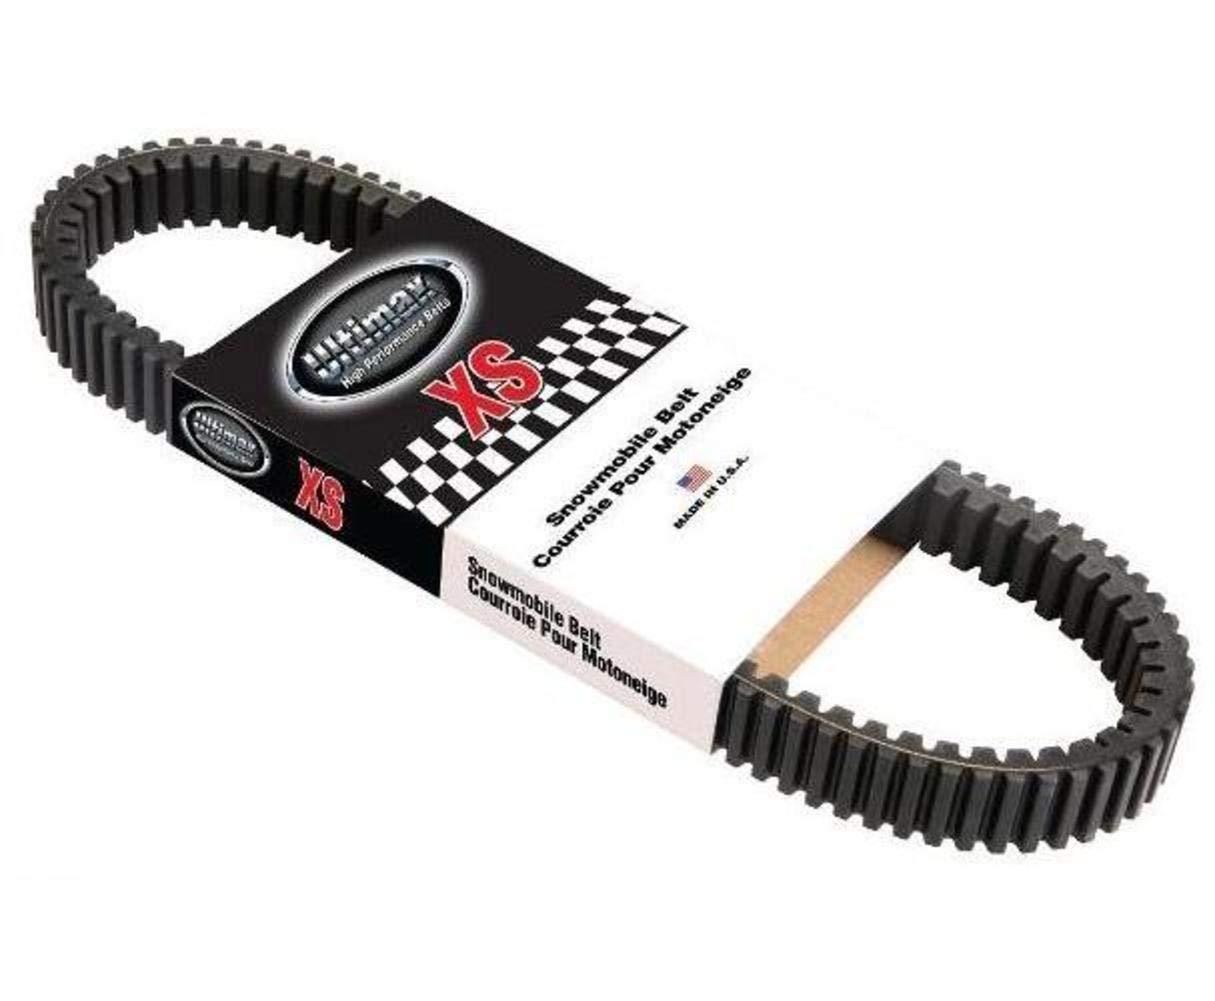 Carlisle Ultimax XS Drive Belt - 1 33/64in. x 43 15/16in. XS821